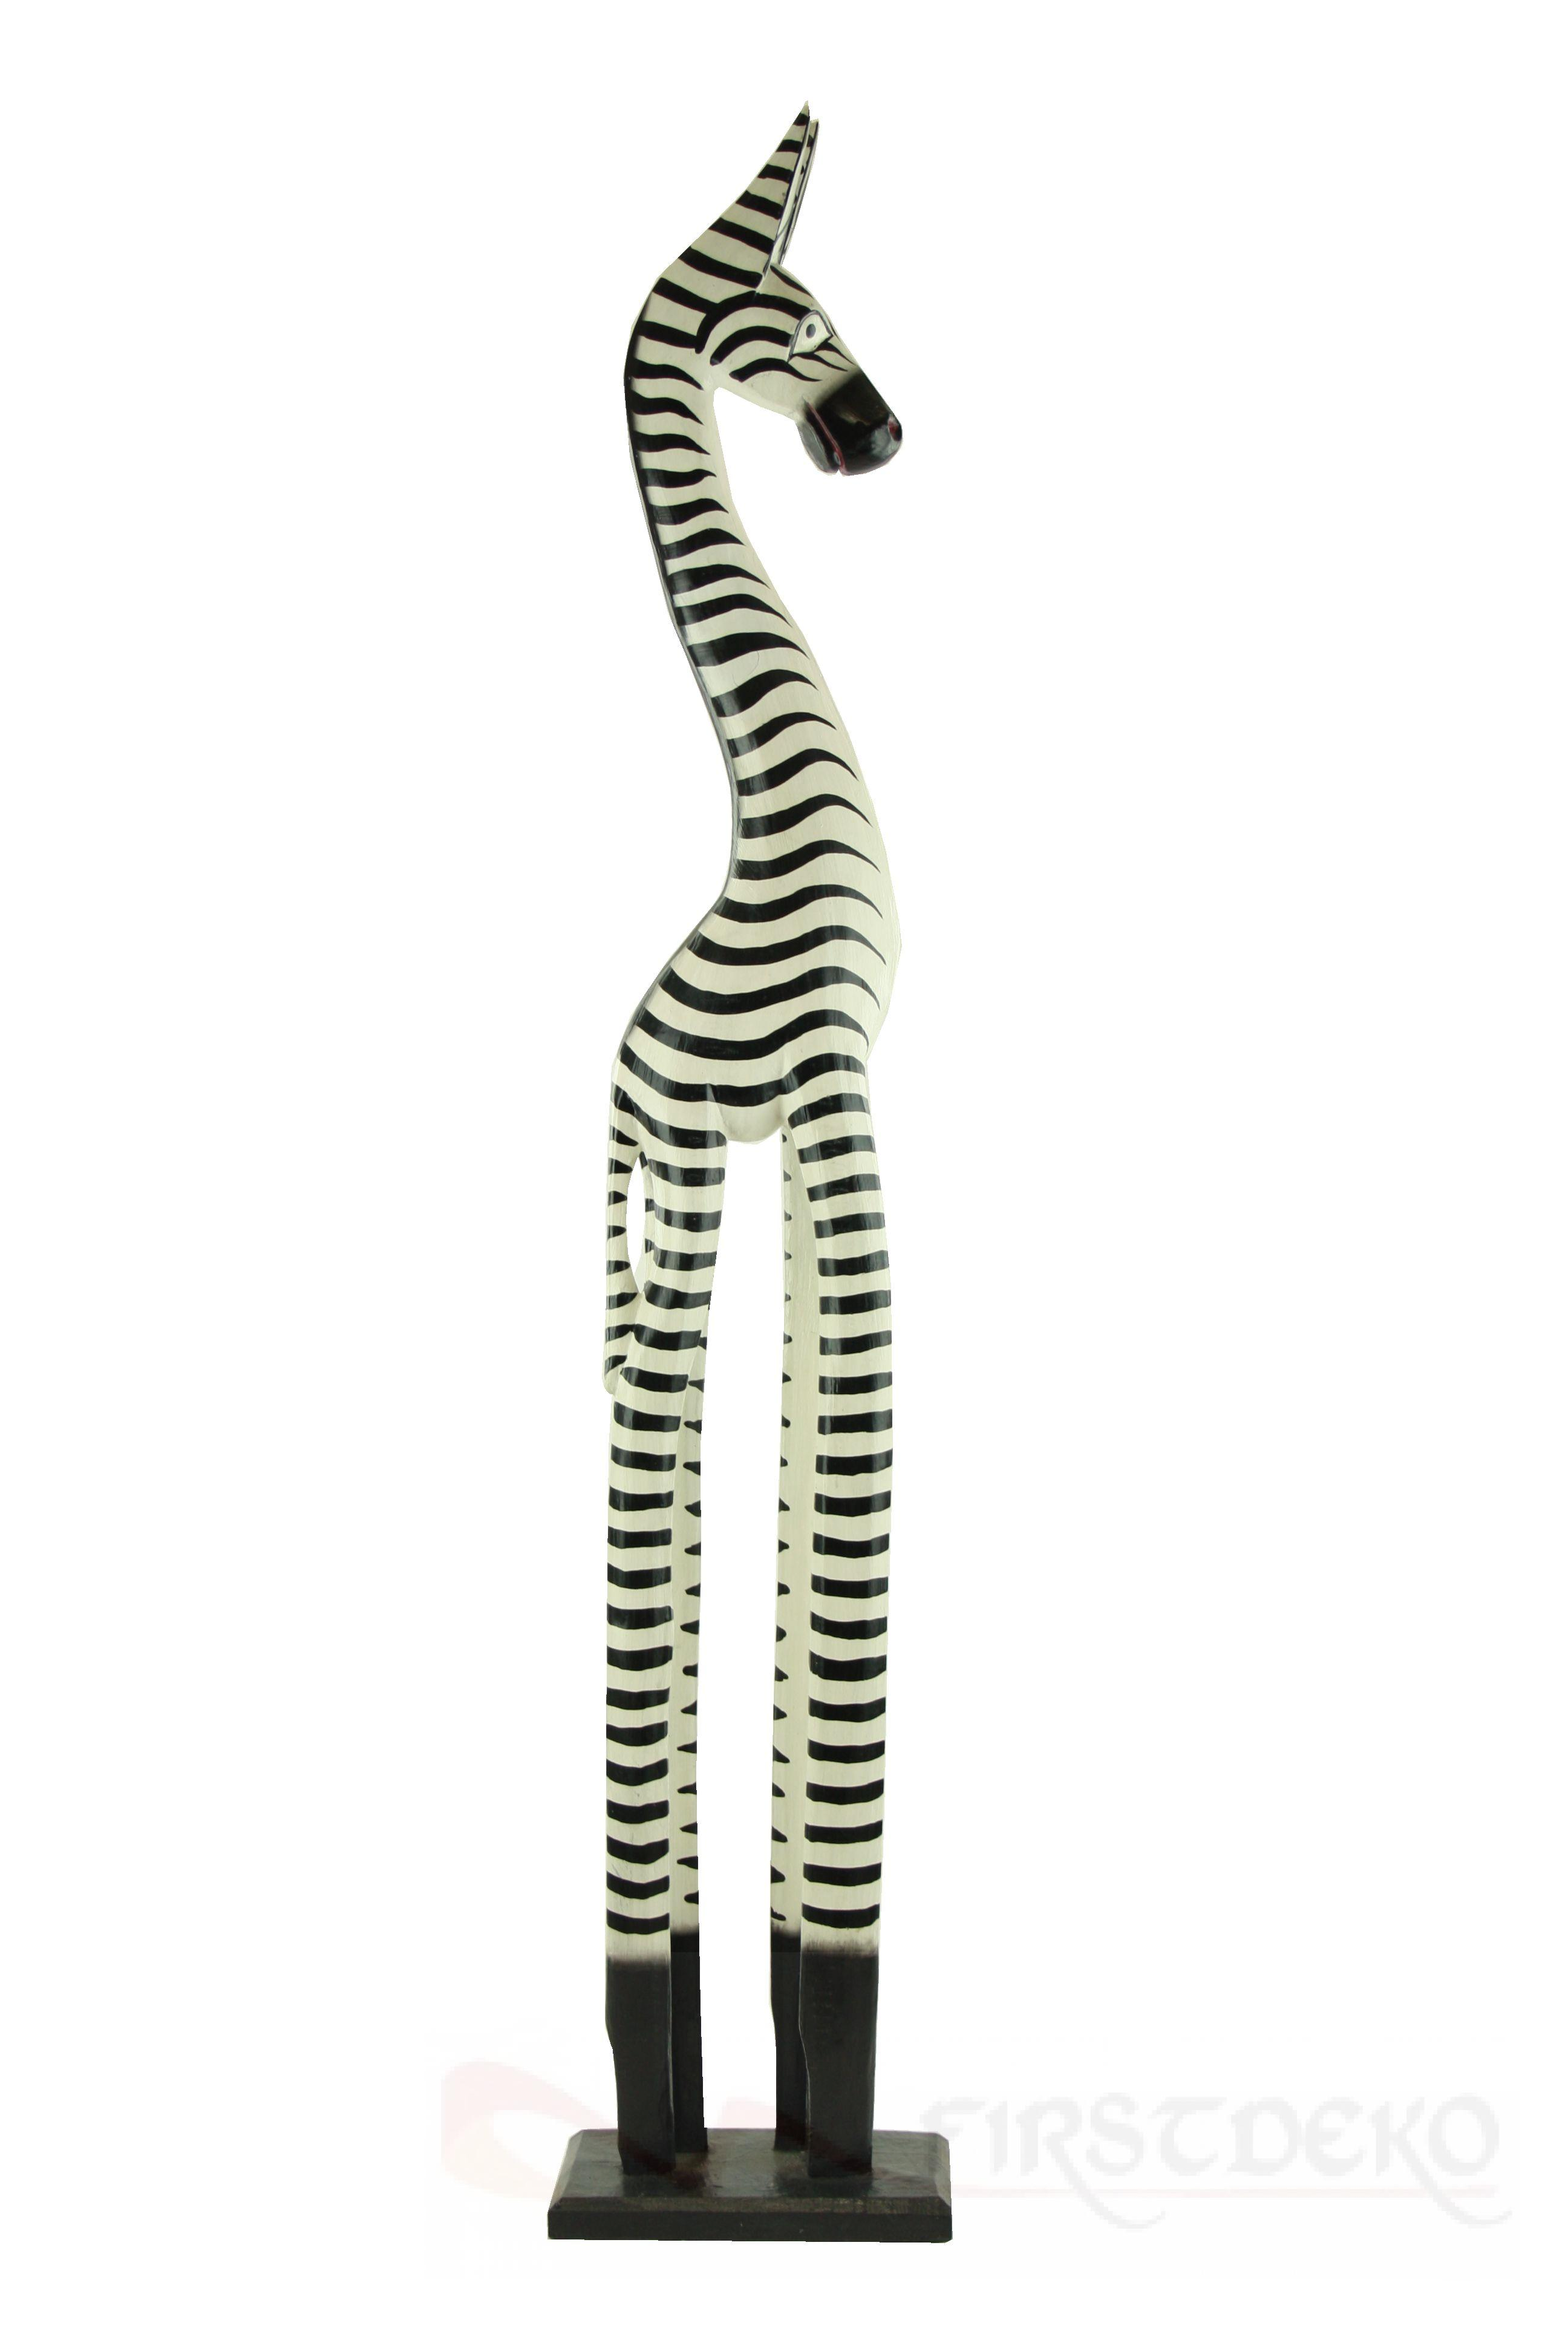 zebra afrika aus holz 60 cm afrikanische deko holzfigur. Black Bedroom Furniture Sets. Home Design Ideas